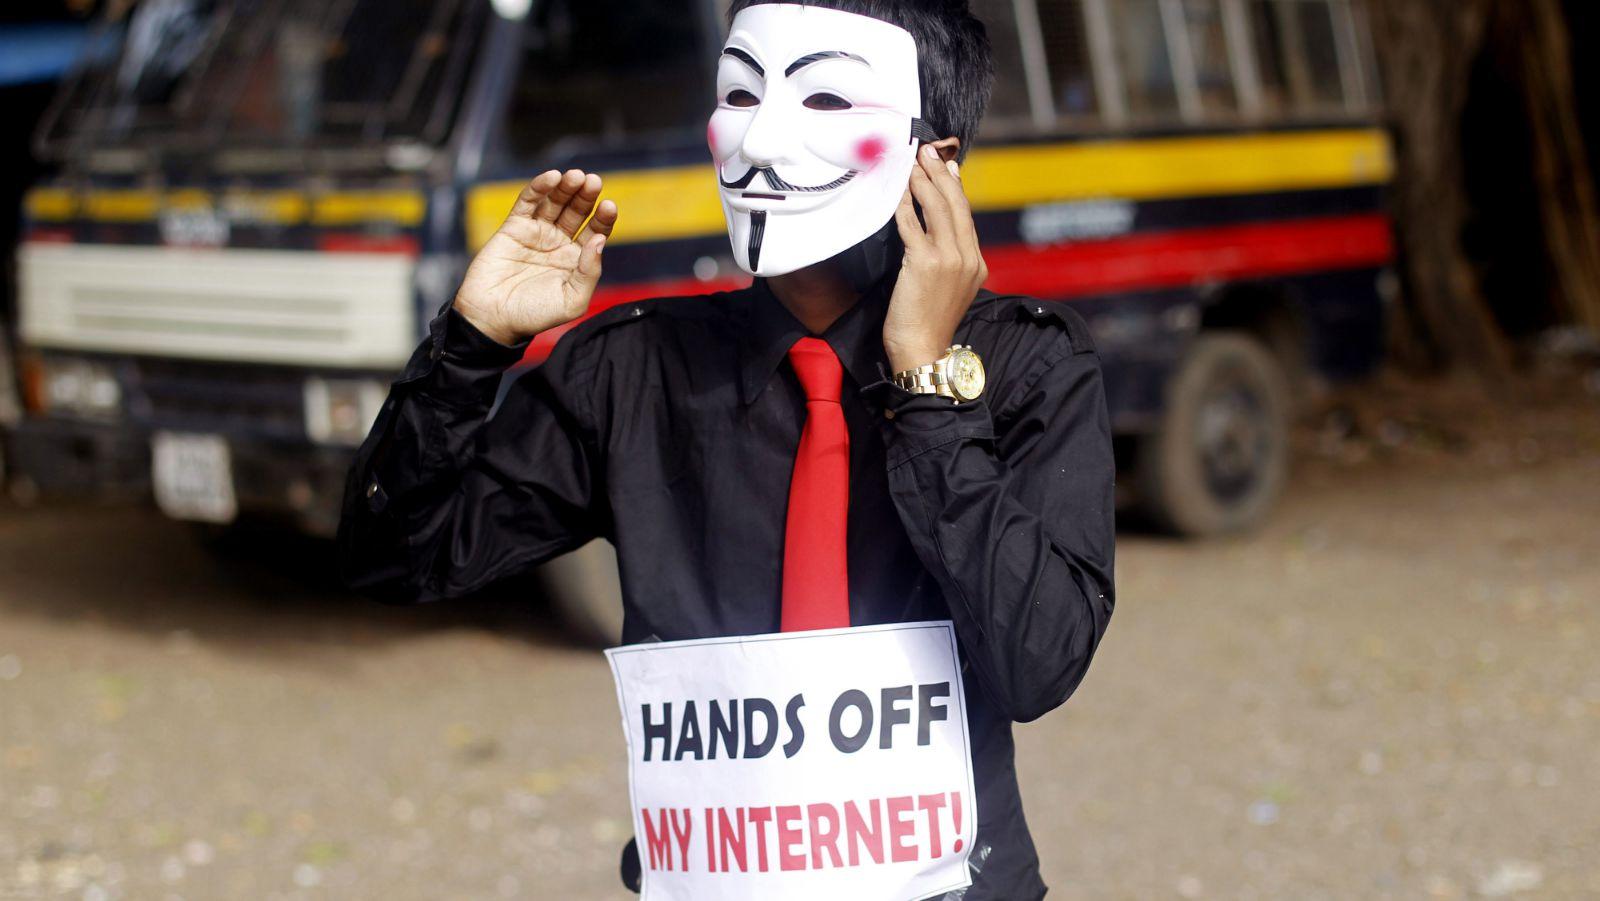 India-Censor-Github